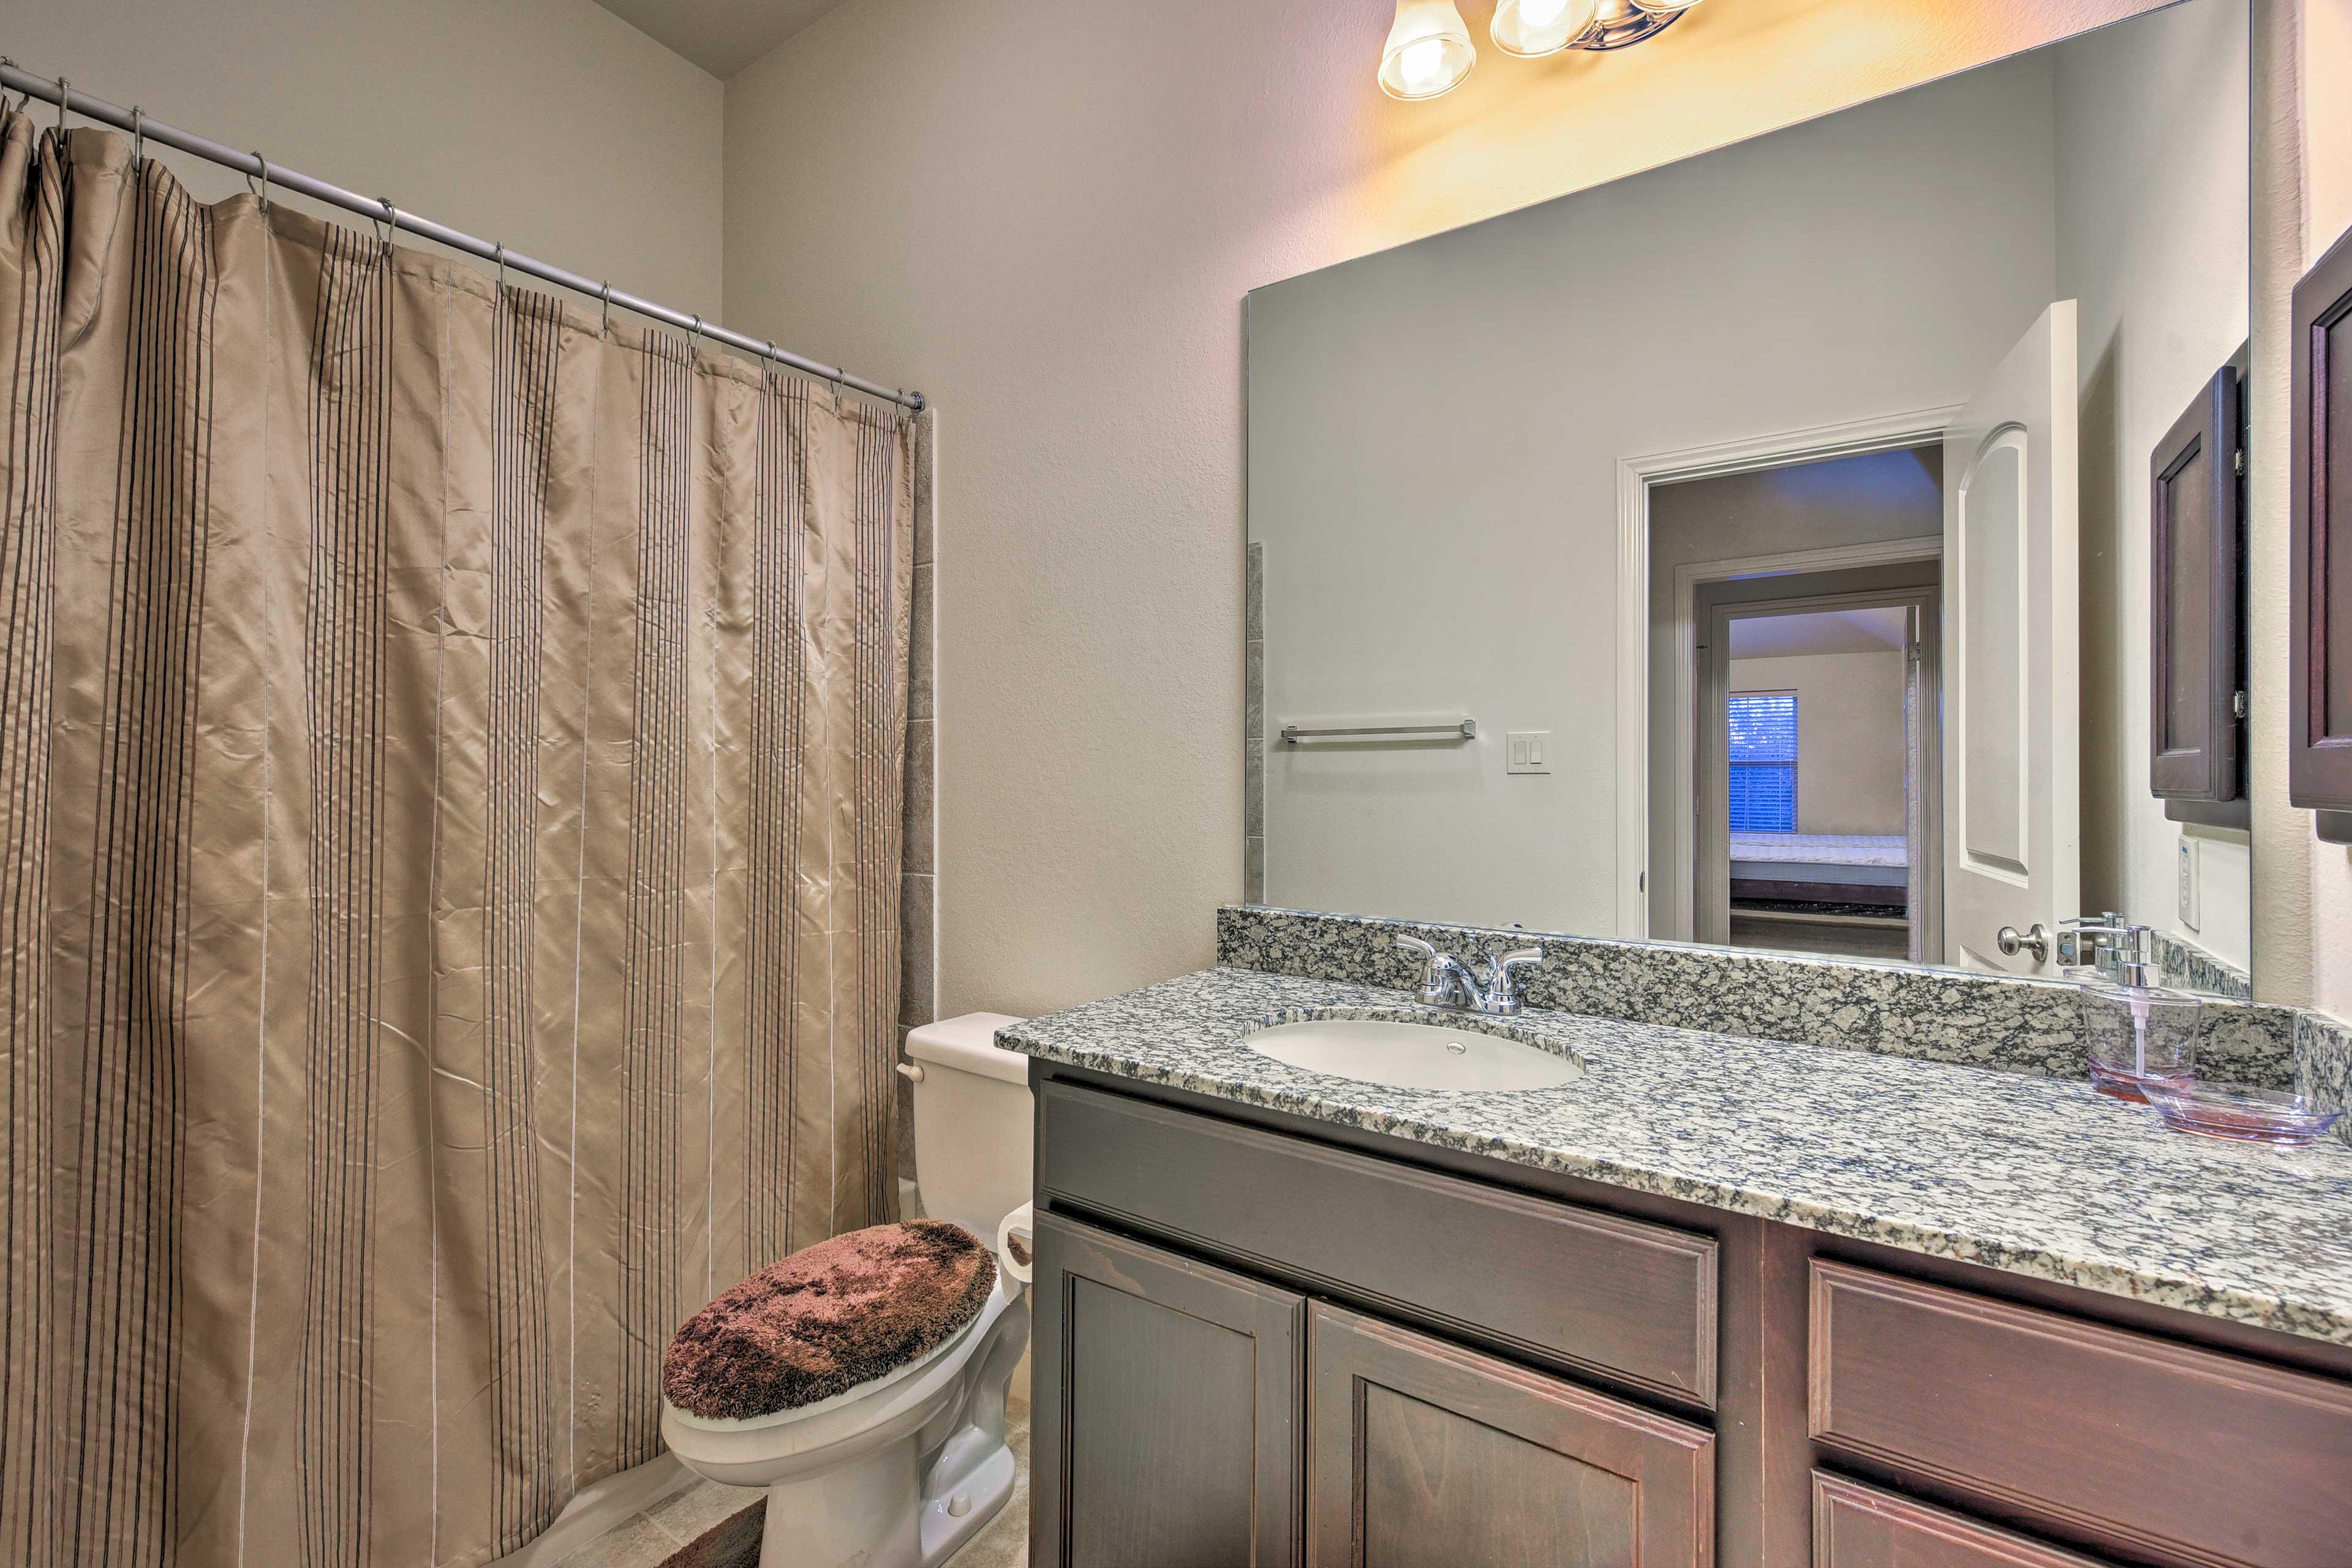 The third bathroom houses a shower/tub combo.